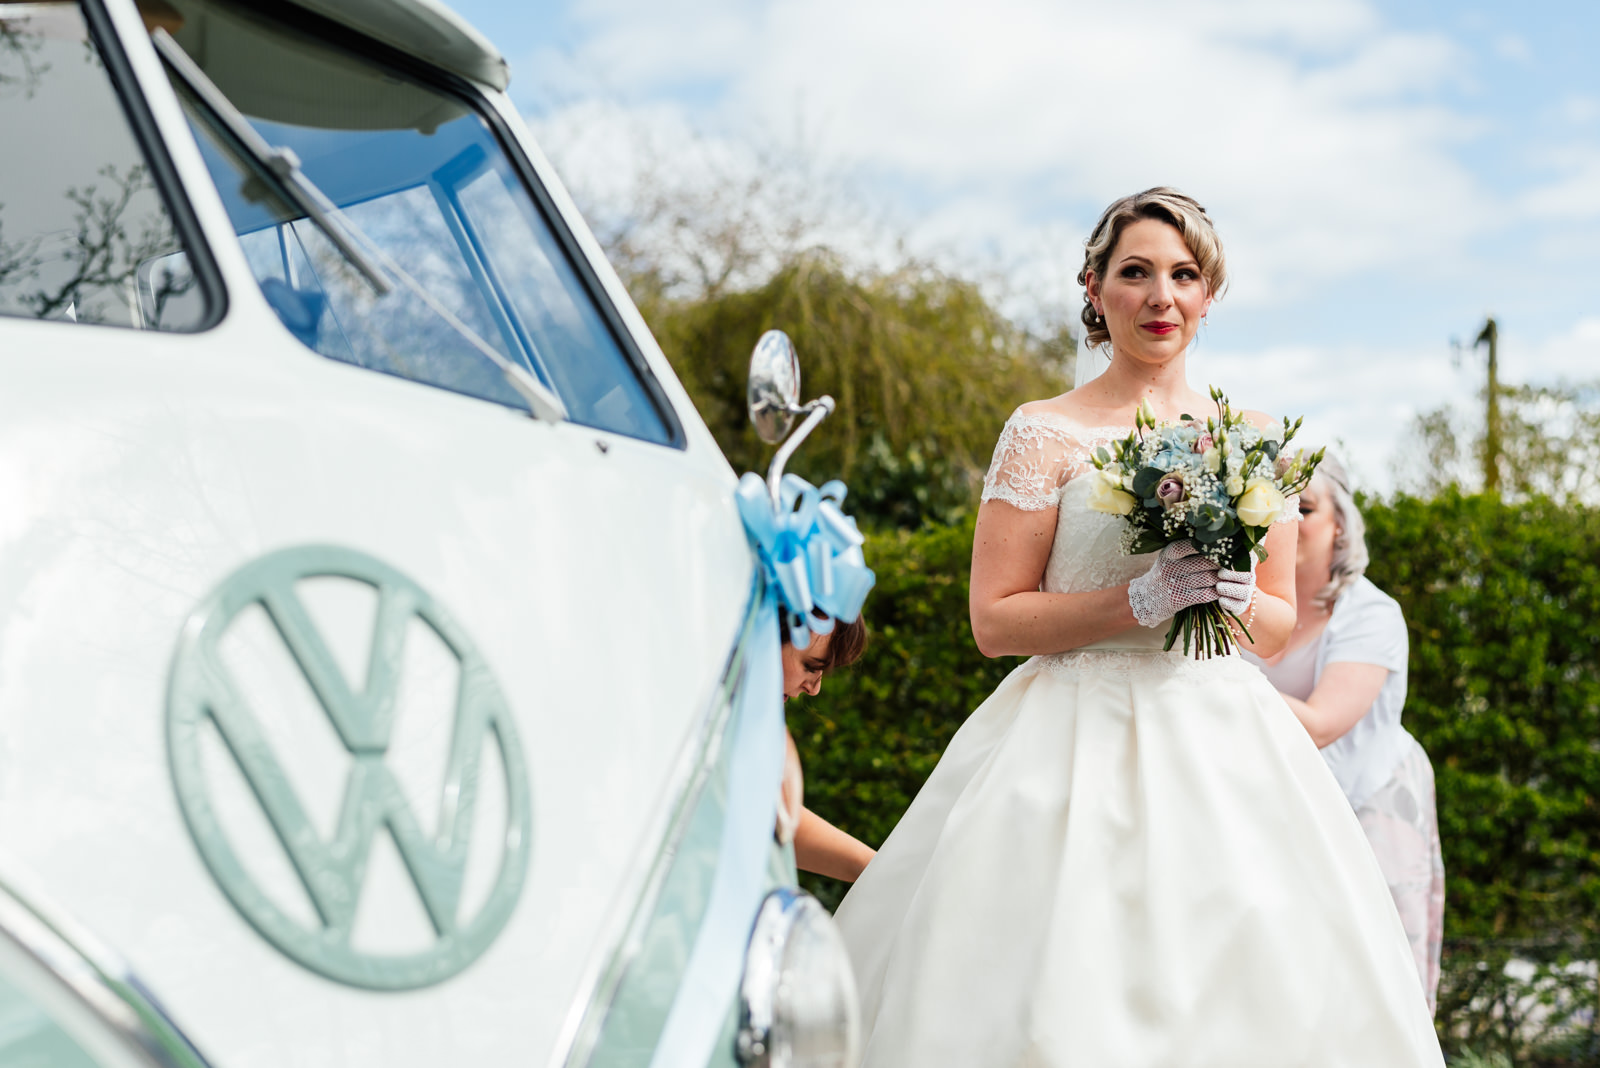 bride standing next to camper van just before walking to church